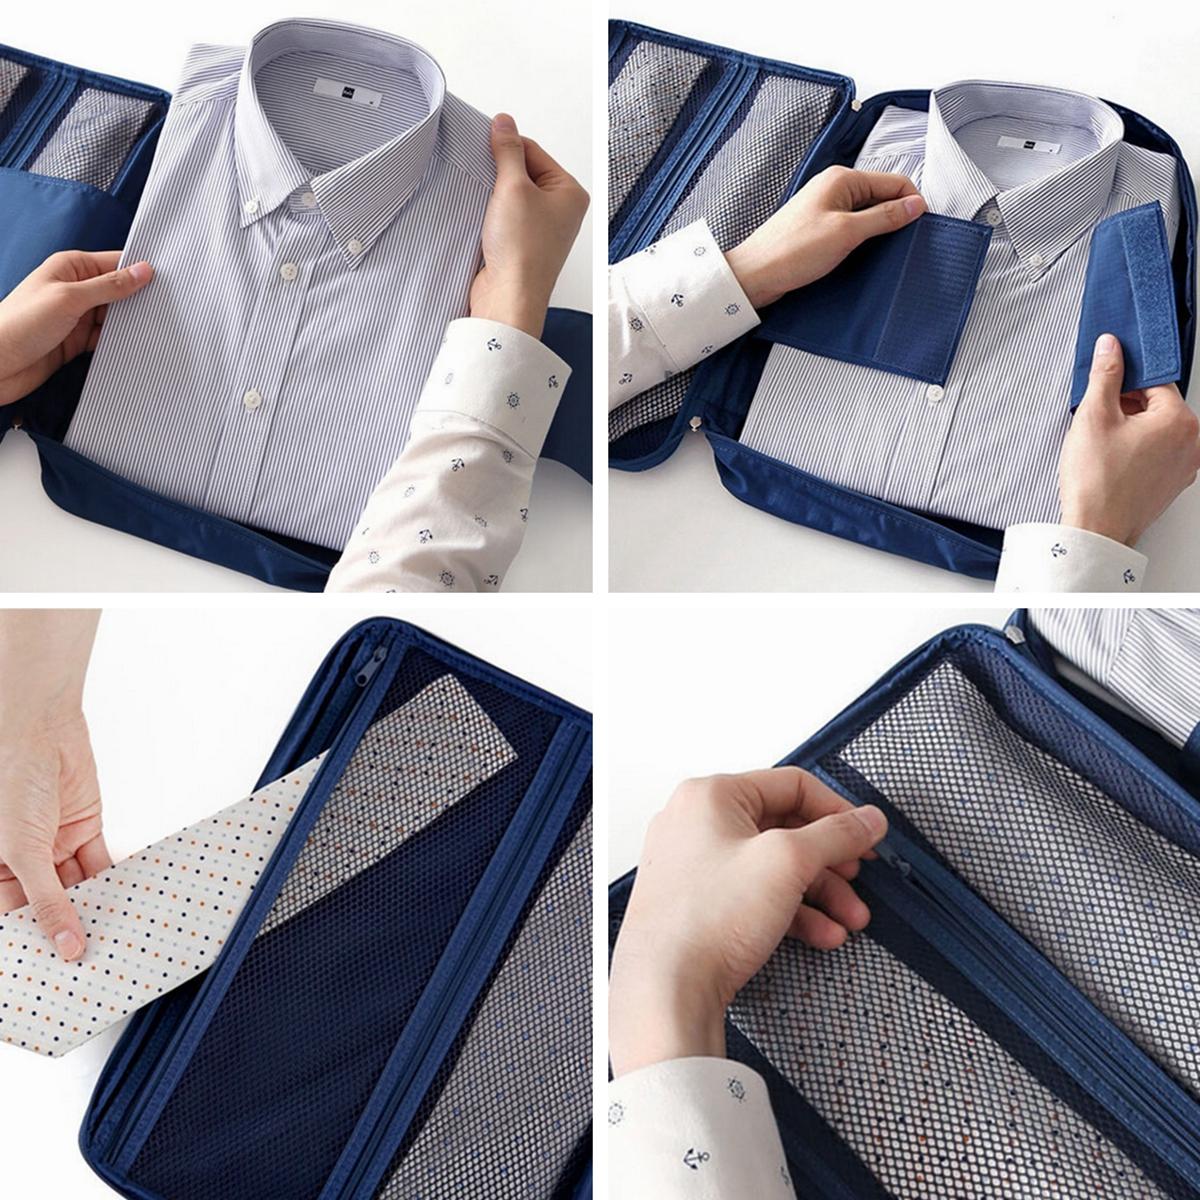 Travel Luggage Storage Organizer Bag Clothes Shirt Tie Suitcase Case Handbag